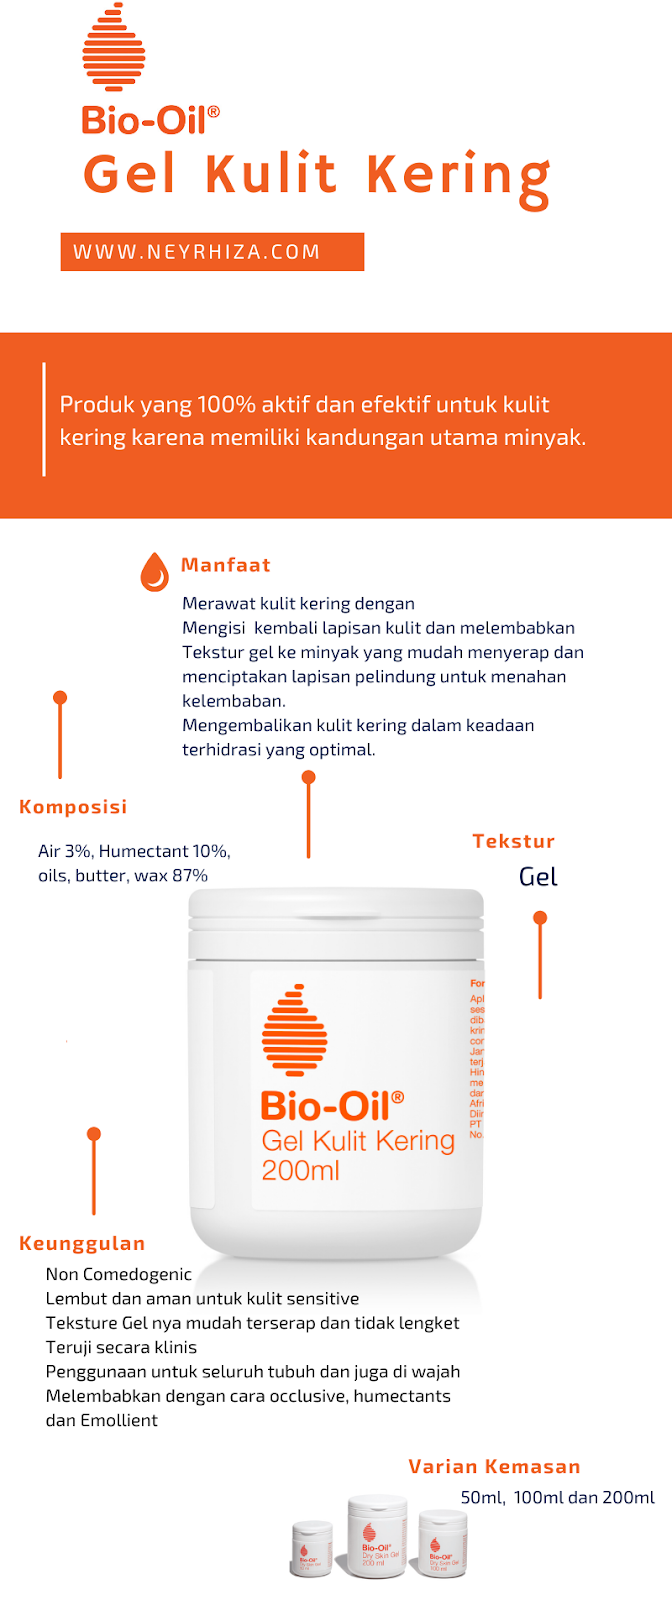 Bio Oil Dry Skin Gel Ampuh Atasi Kulit Kering Kamu Pakai Juga Kan Sara Neyrhiza Praktisi Dan Pengajar Komunikasi